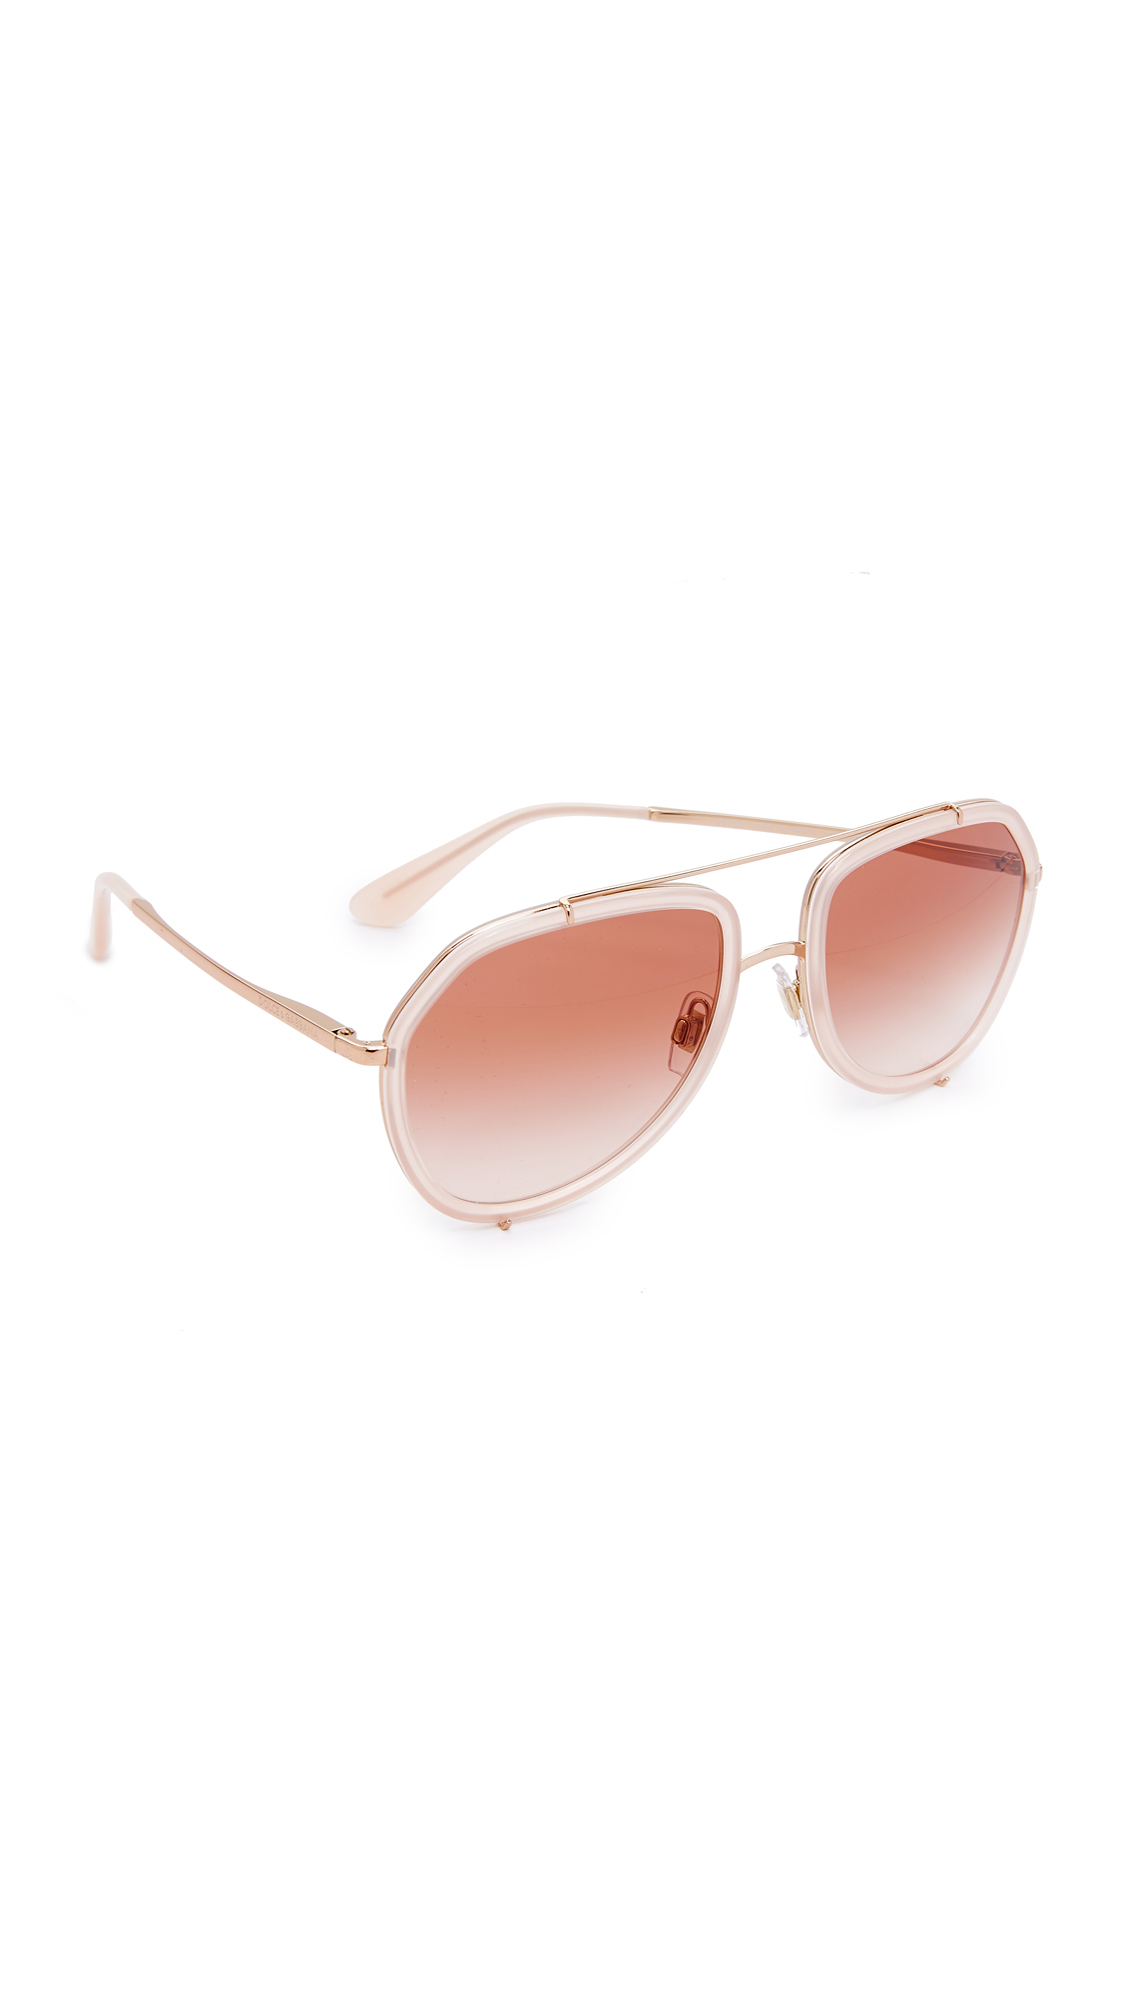 Dolce & Gabbana Aviator Sunglasses - Opal Pink/Pink at Shopbop